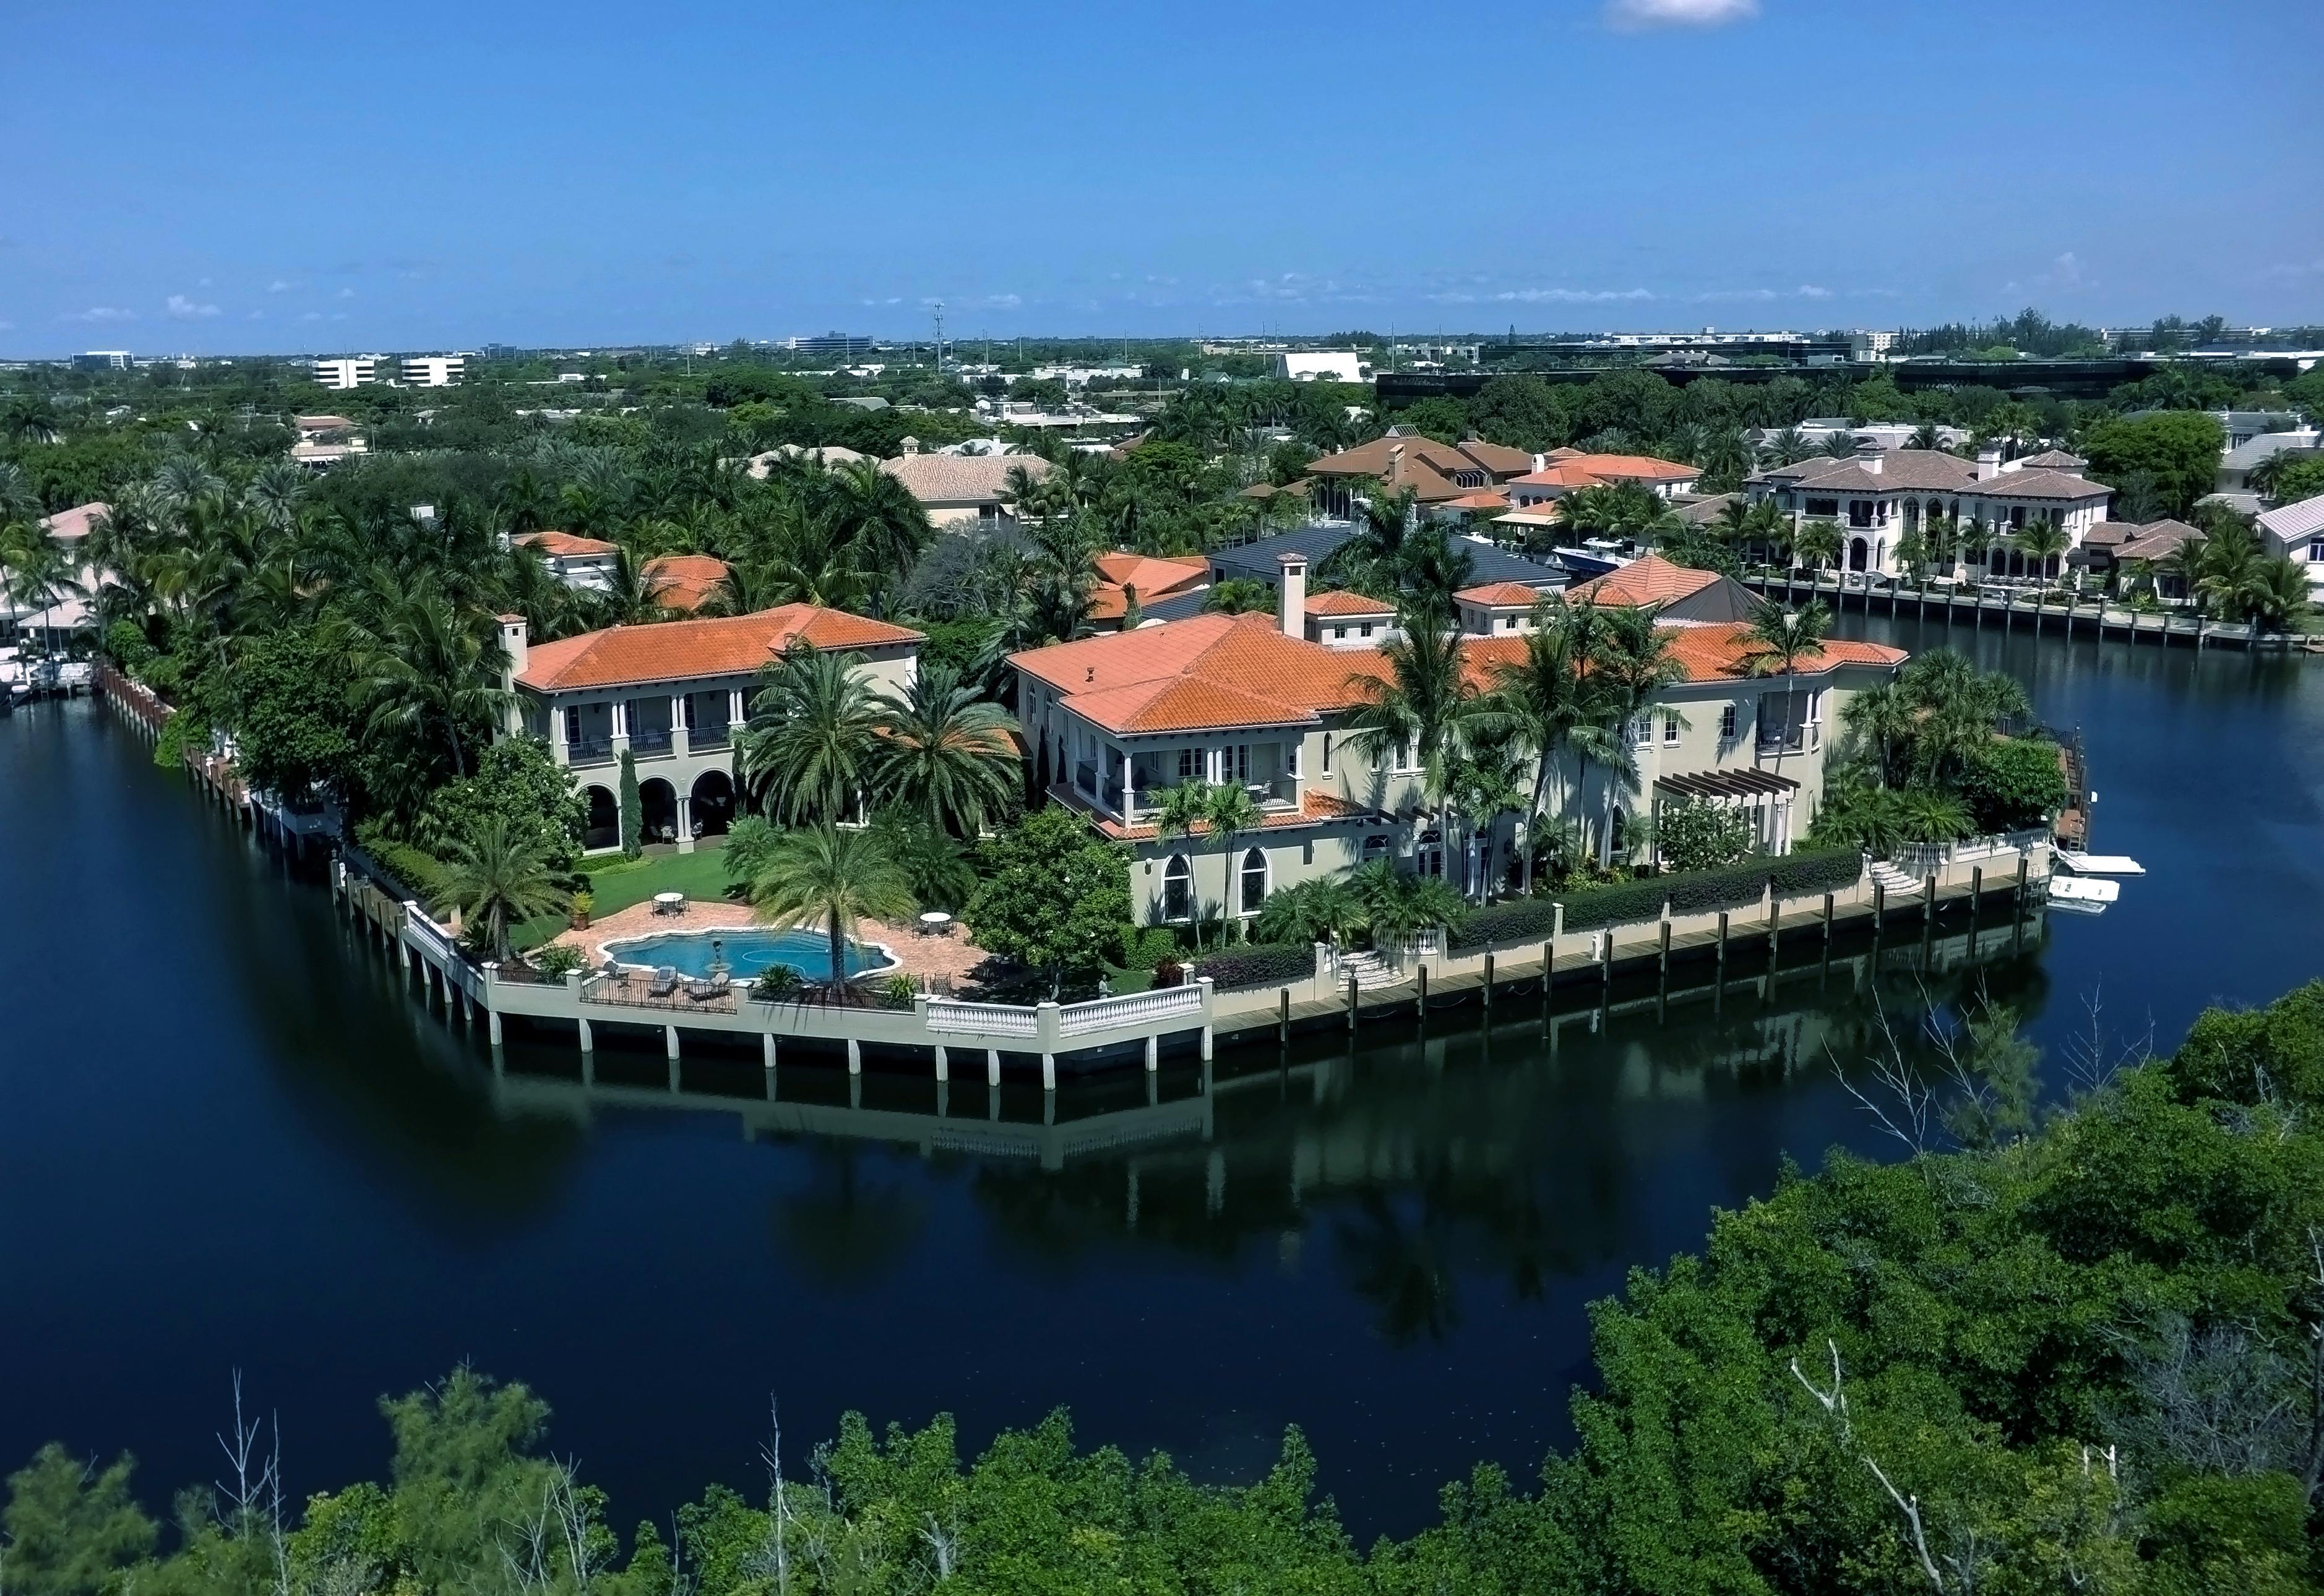 Boca Raton Watrerfront Luxury Real Estate Marketing Specialists_The Sanctuary Yachting Homes For Sale_799 Sanctuary Drive_Boca Raton Florida 33431